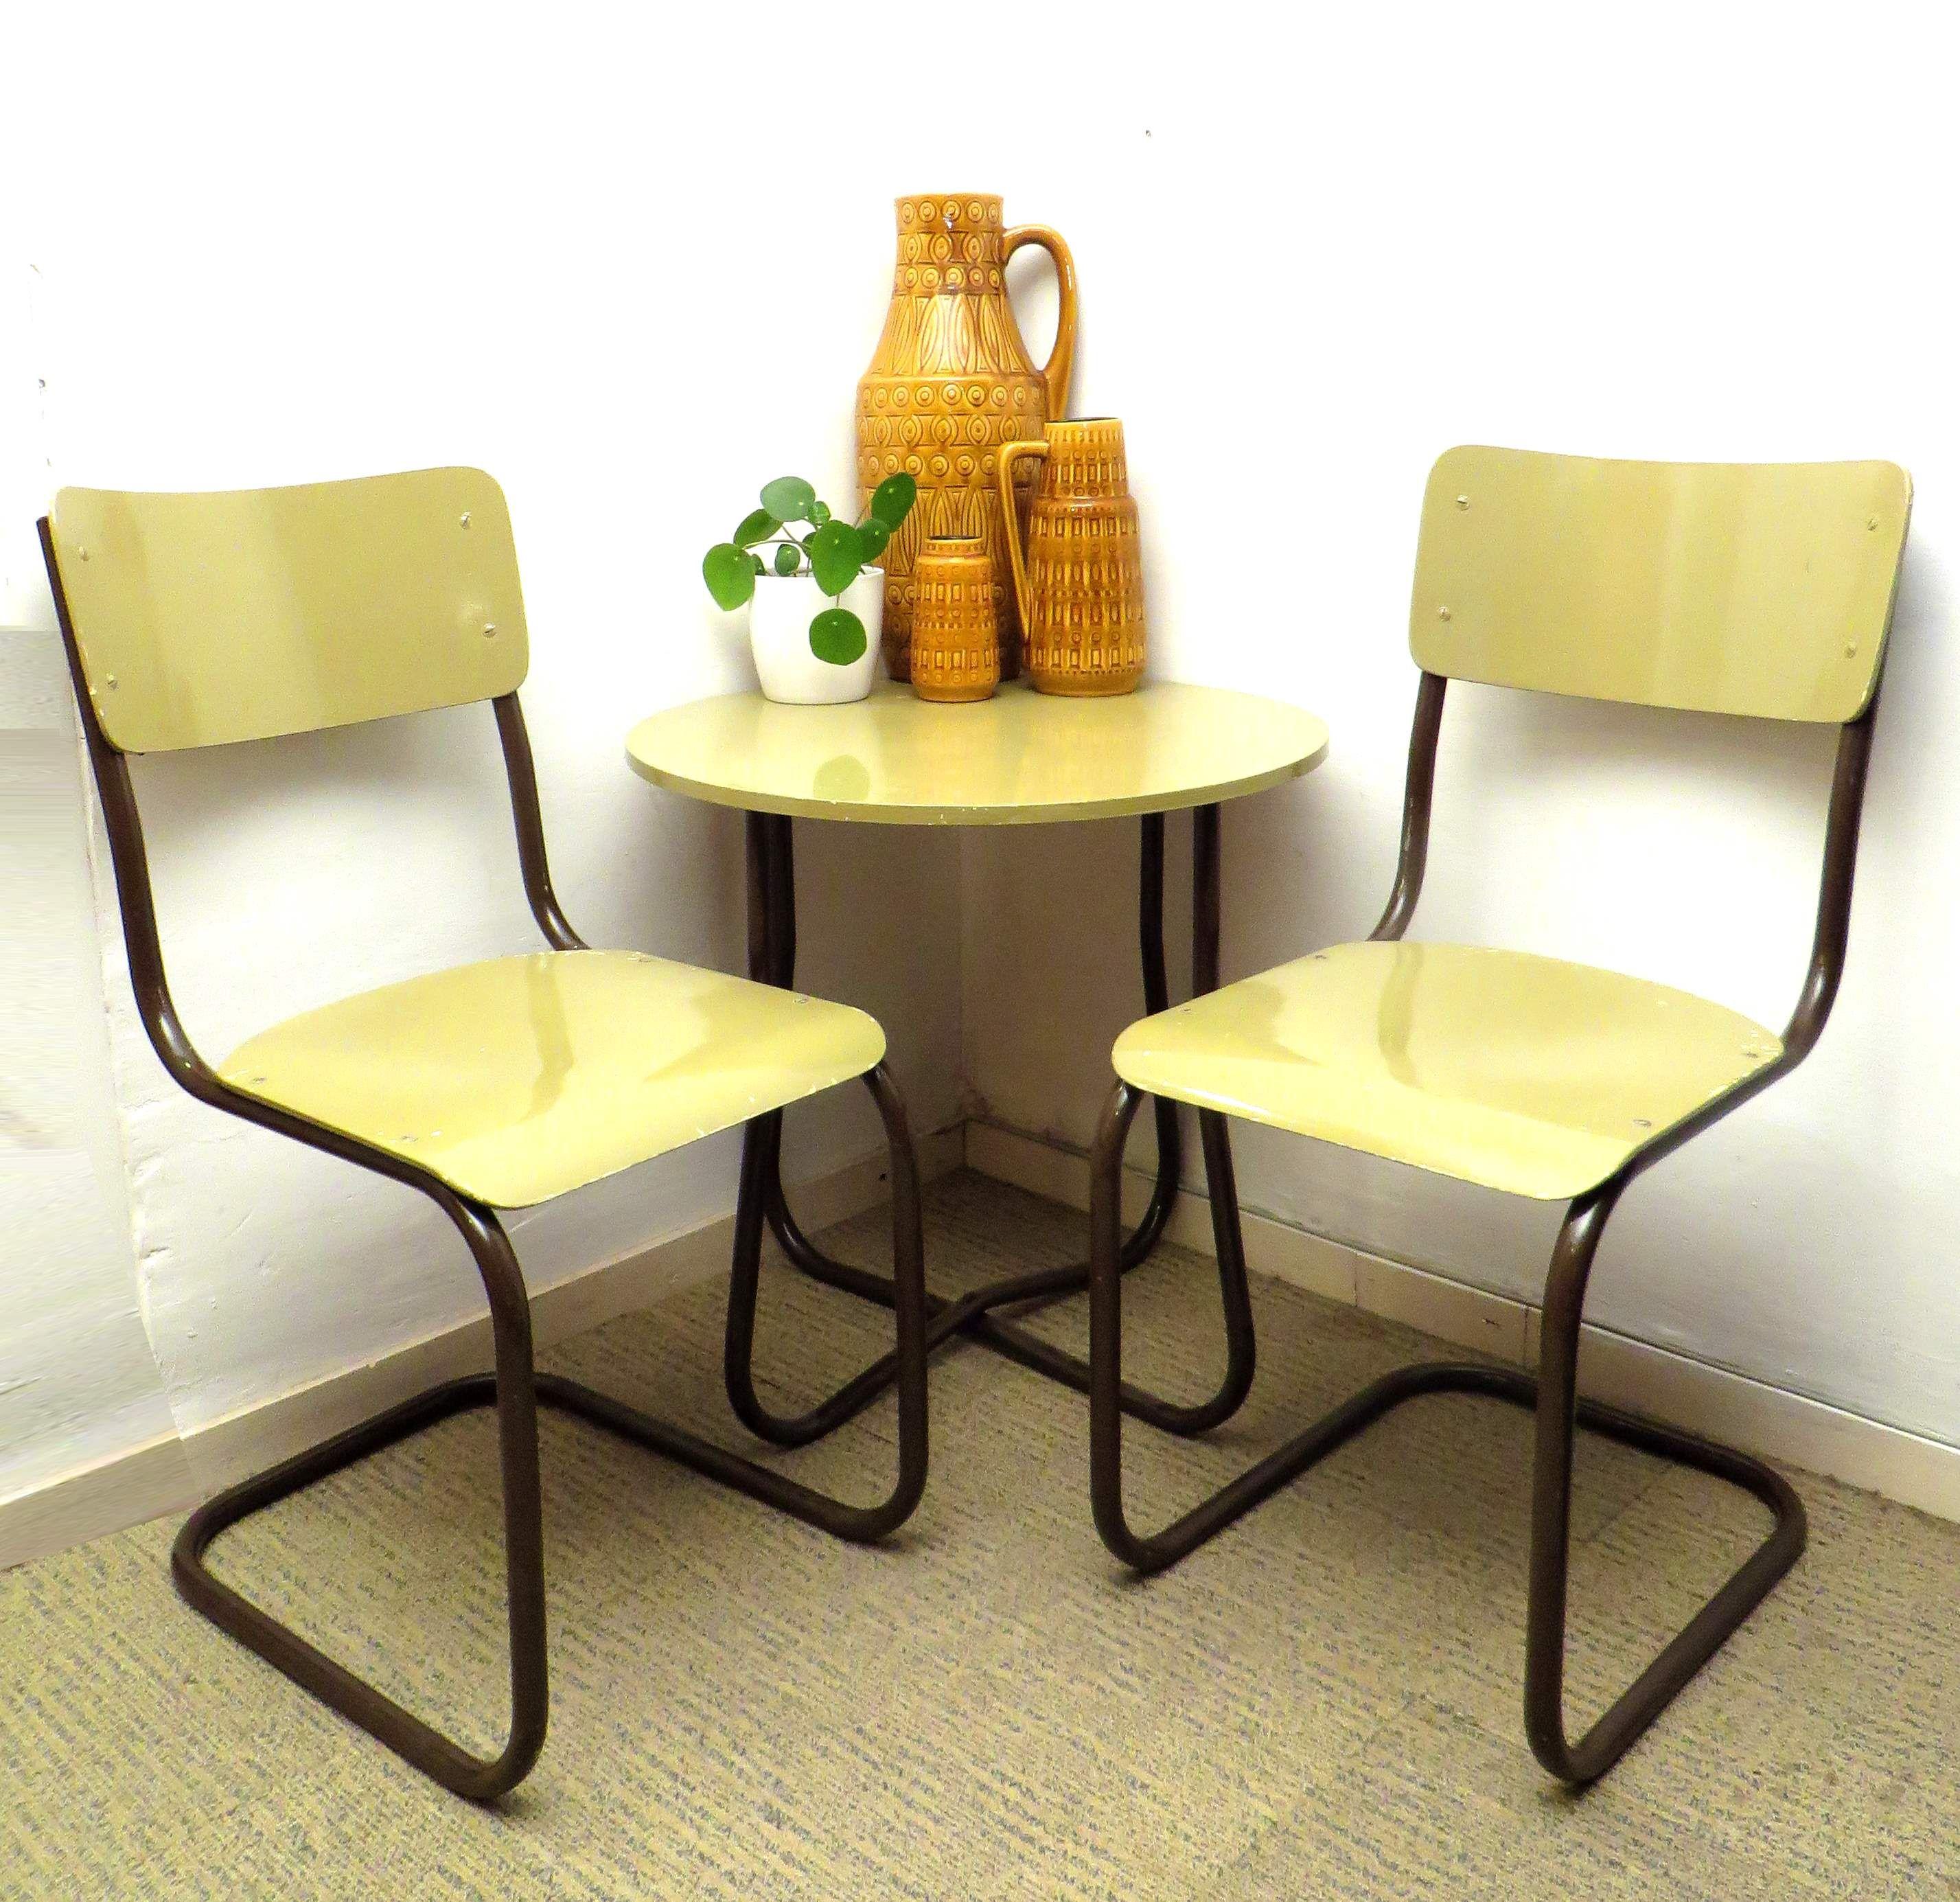 Keukentafel stoelen ontwerp for Keukentafel en stoelen